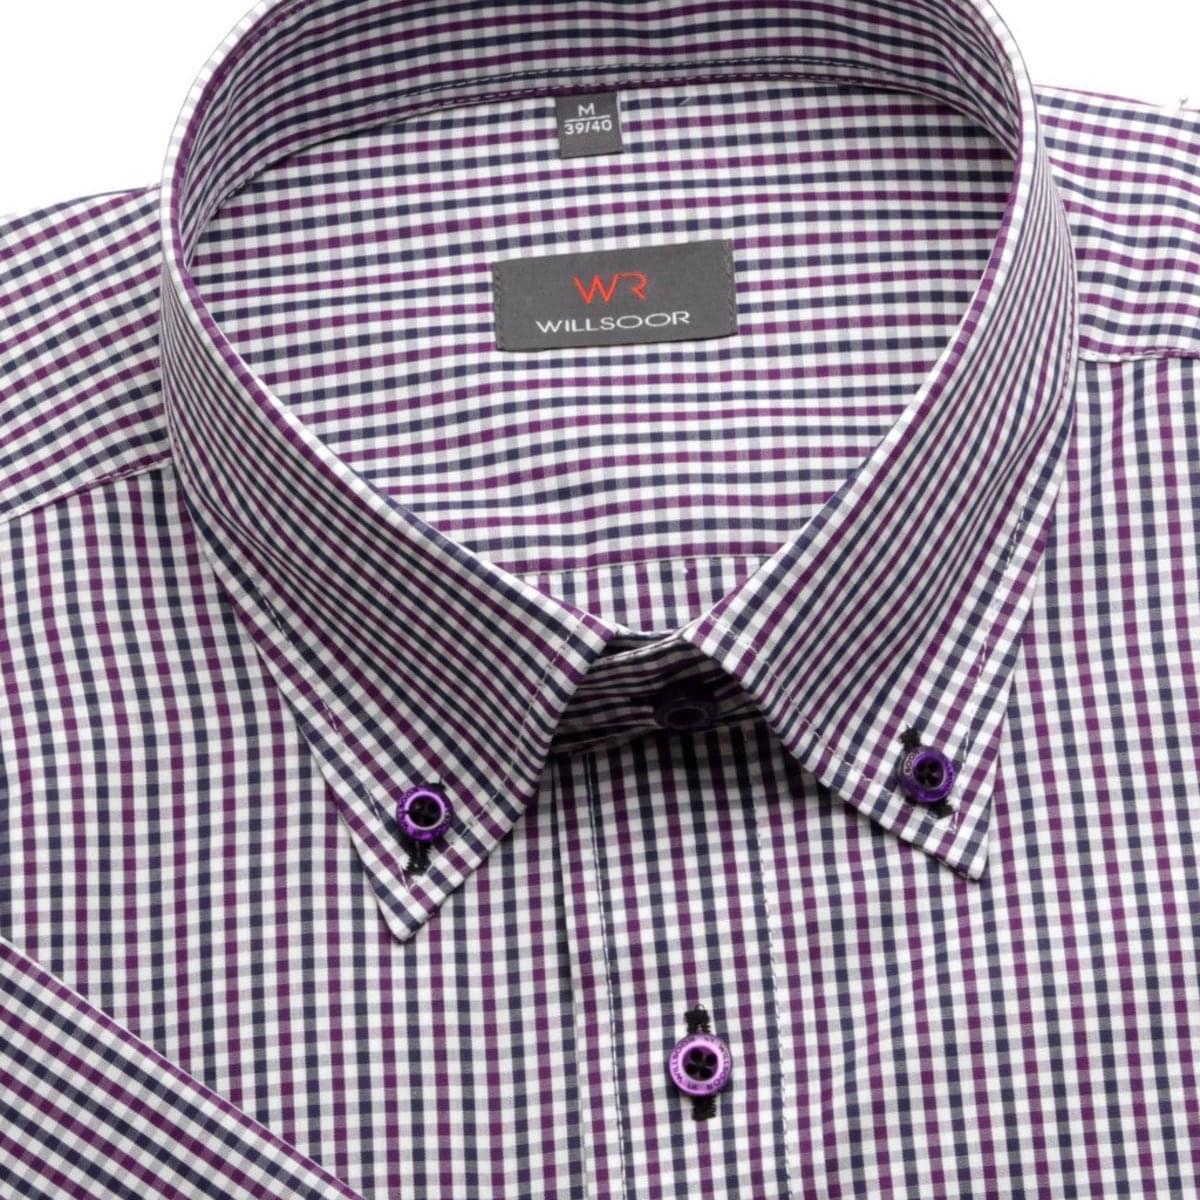 Pánská košile WR Slim Fit s krátkým rukávem a drobnou kostkou fialové a modré barvy (výška 176-182) 176-182 / M (39/40)